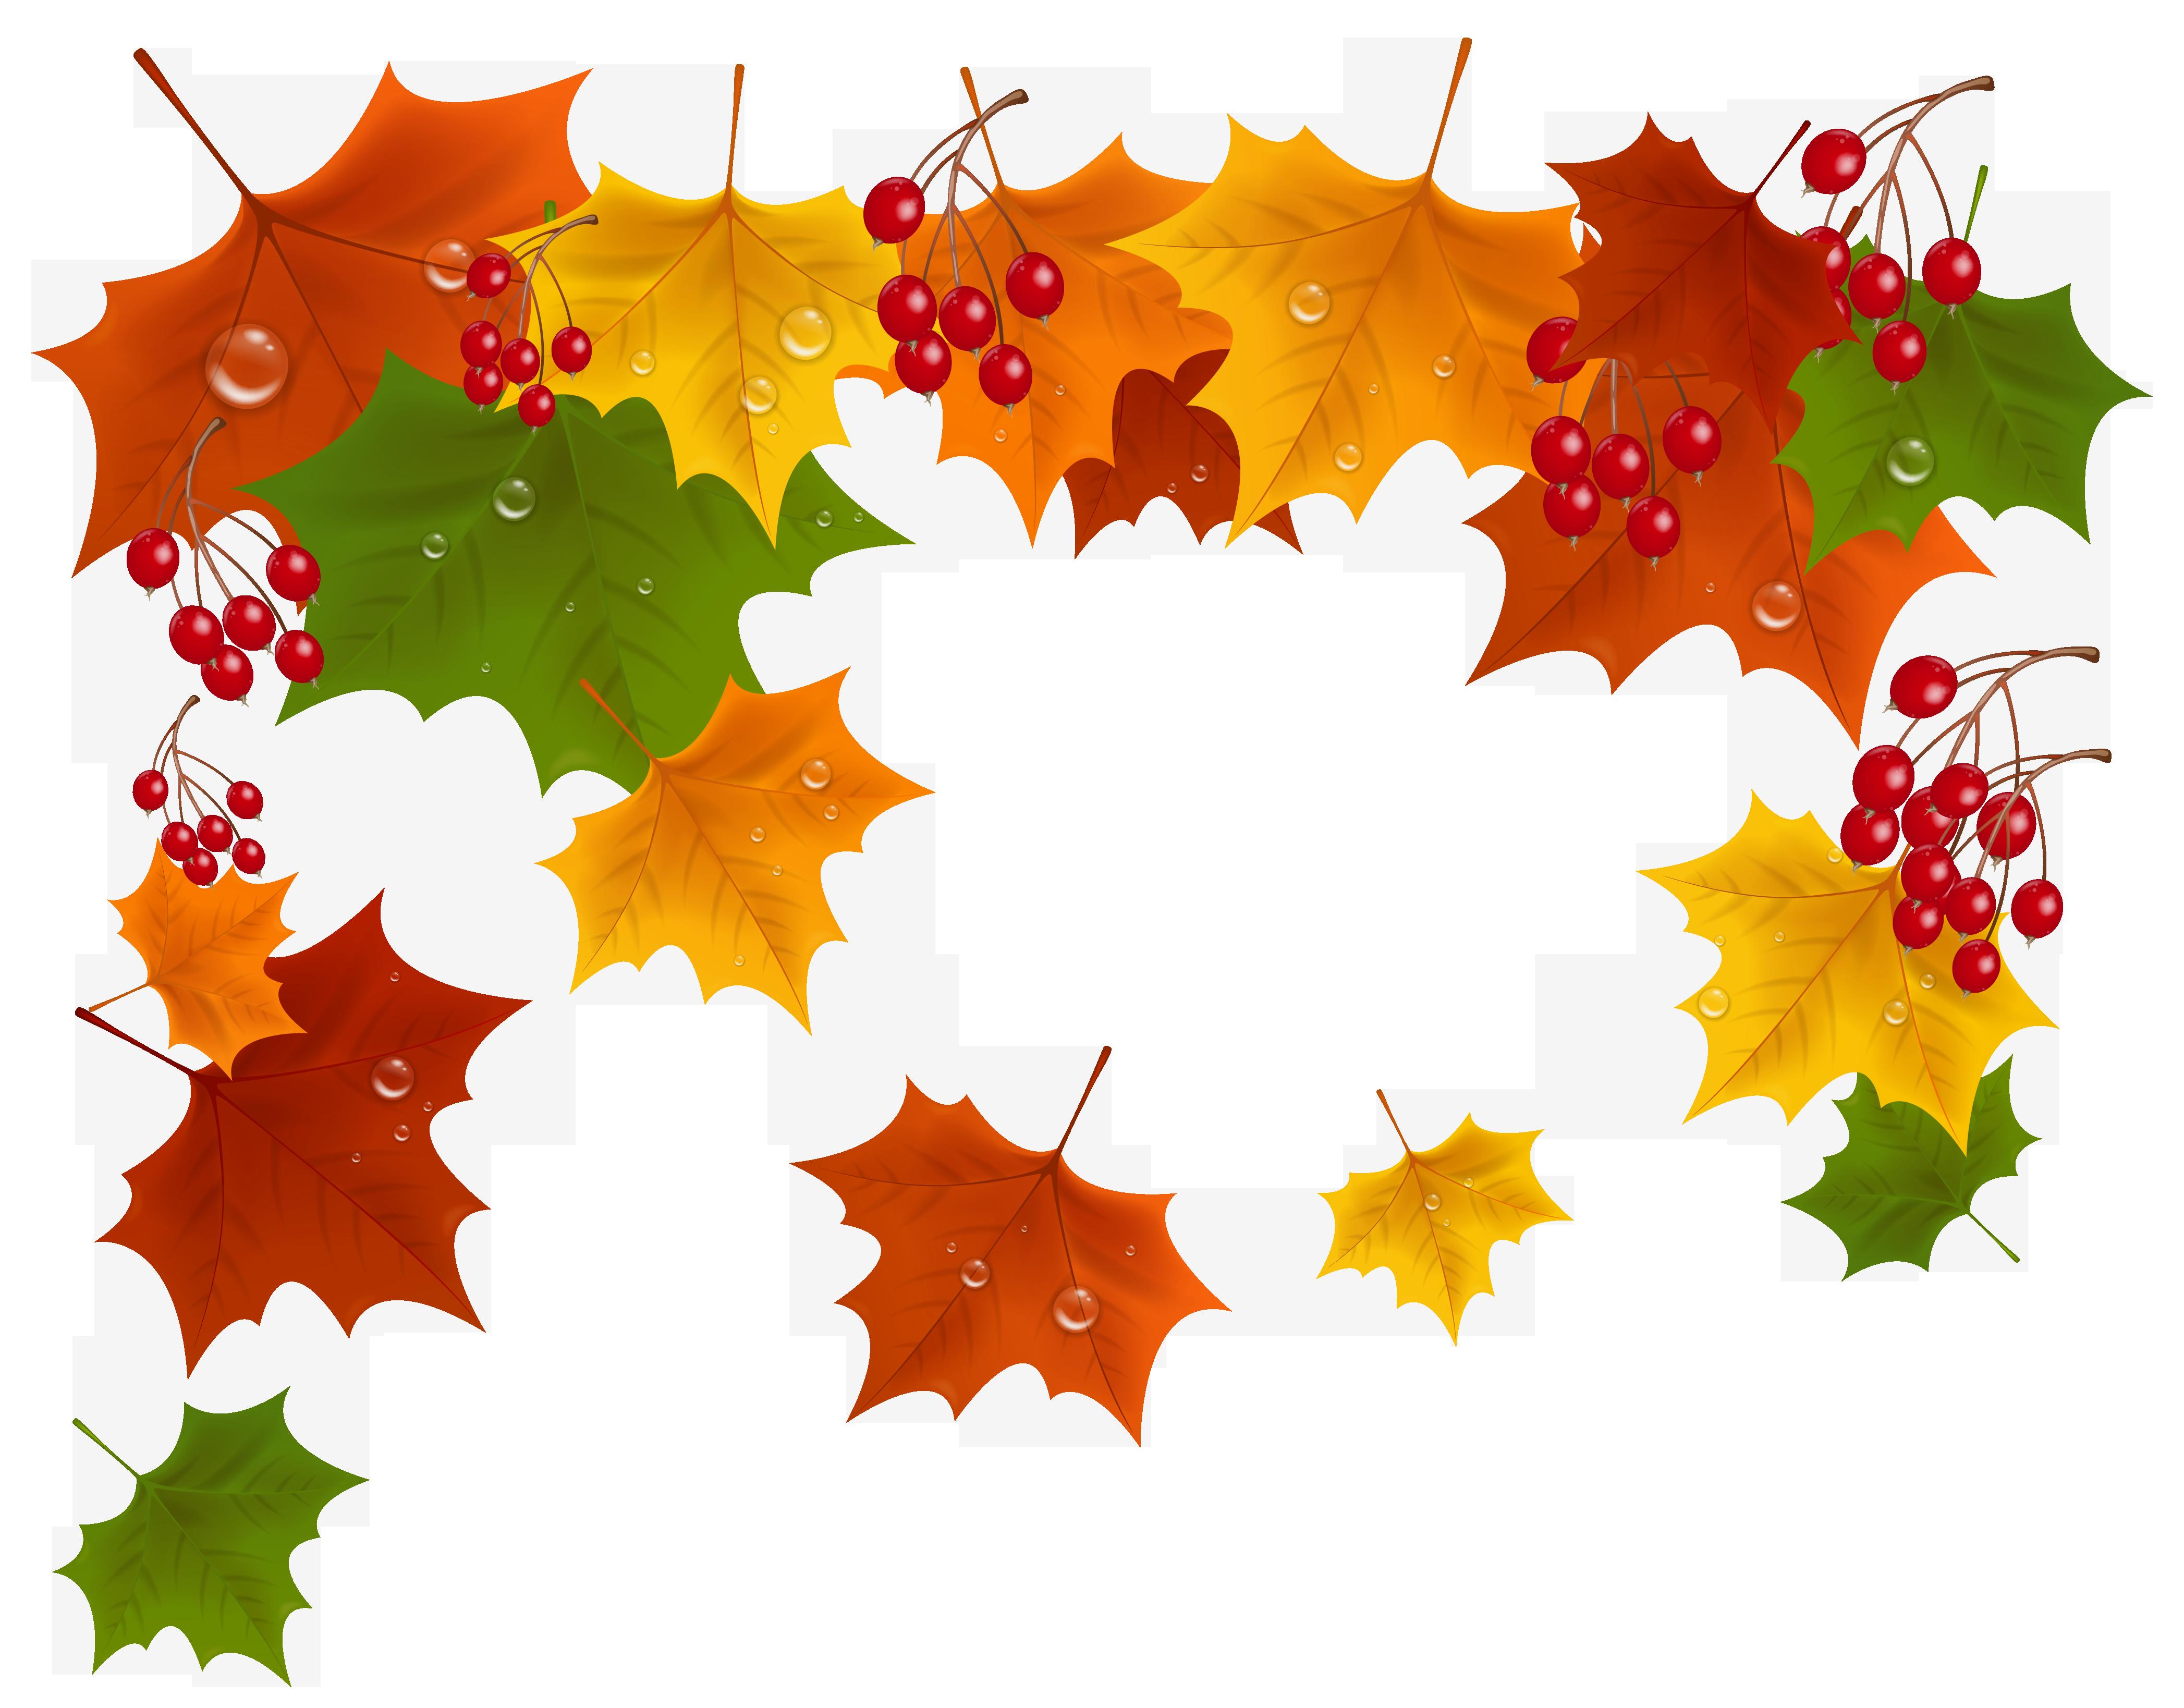 Thanksgiving decorations clipart graphic transparent stock fall decor png - Left.handsintl.co graphic transparent stock